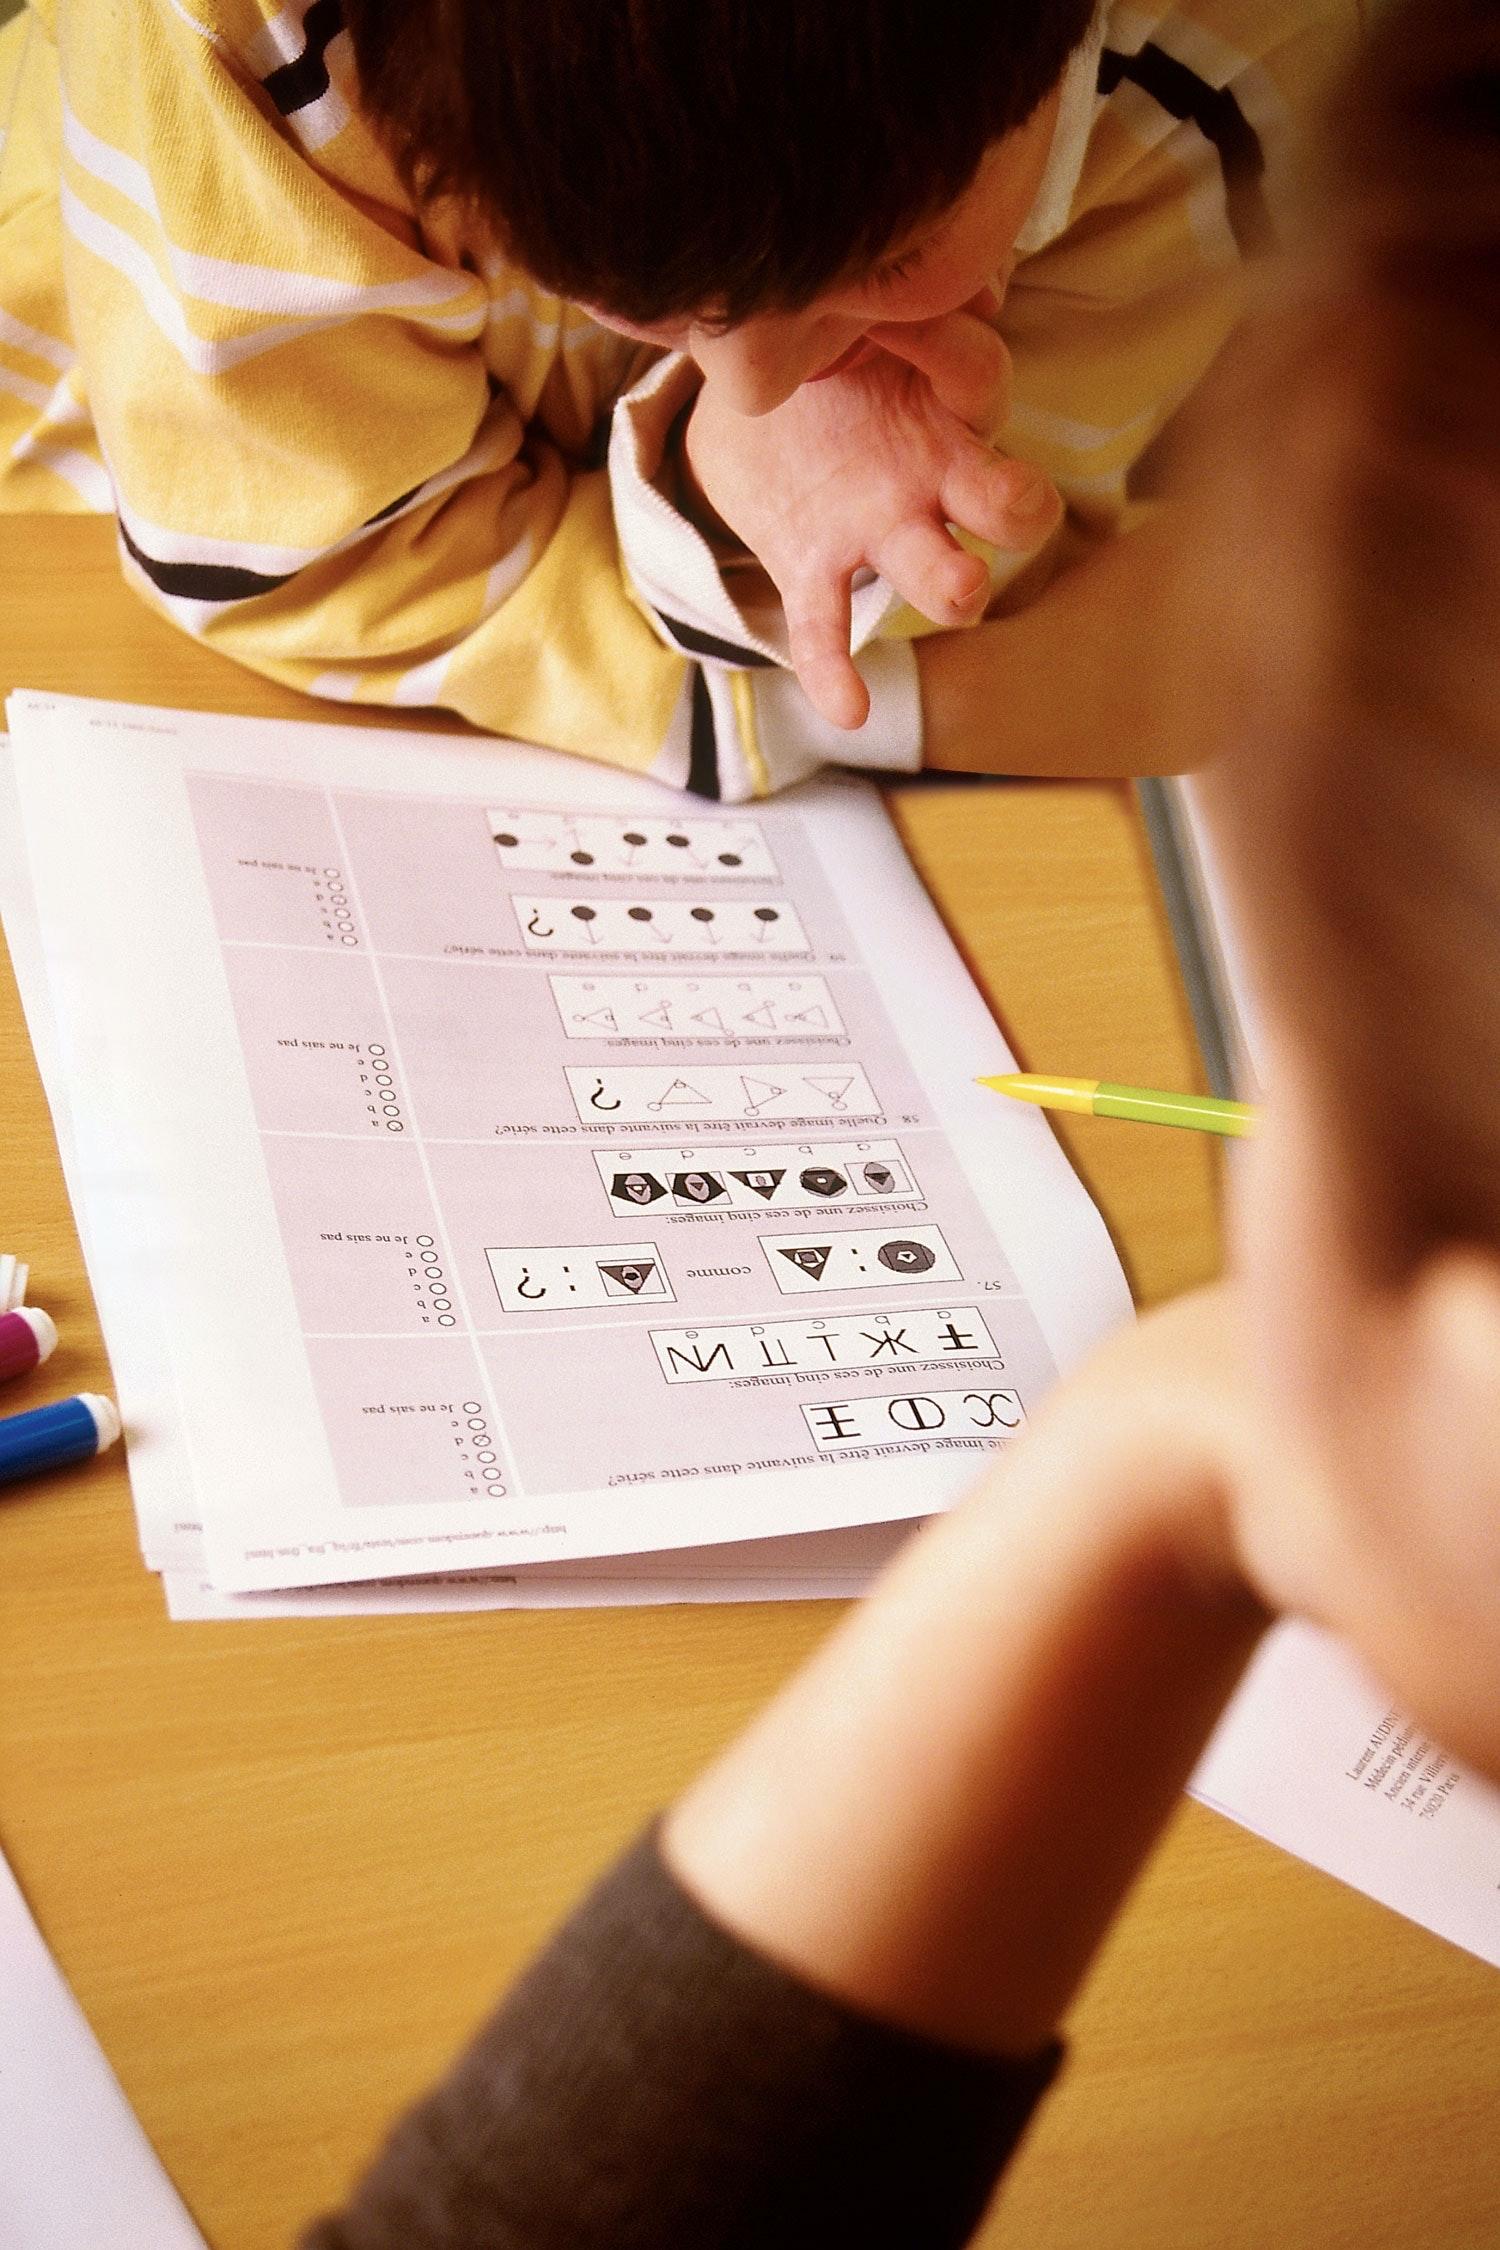 Child with IQ-test